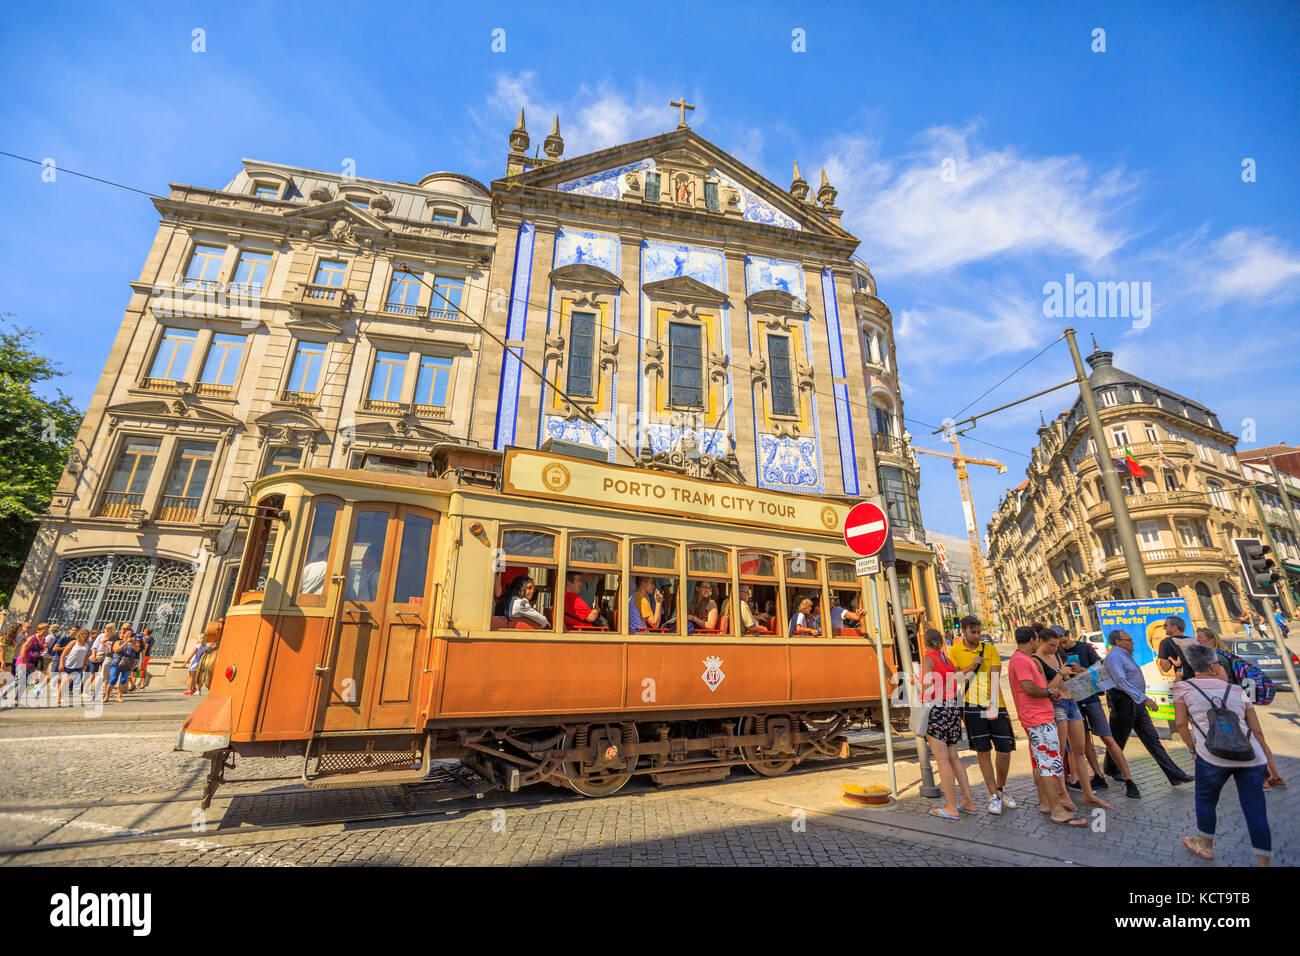 Porto Tram City Tour Stock Photo